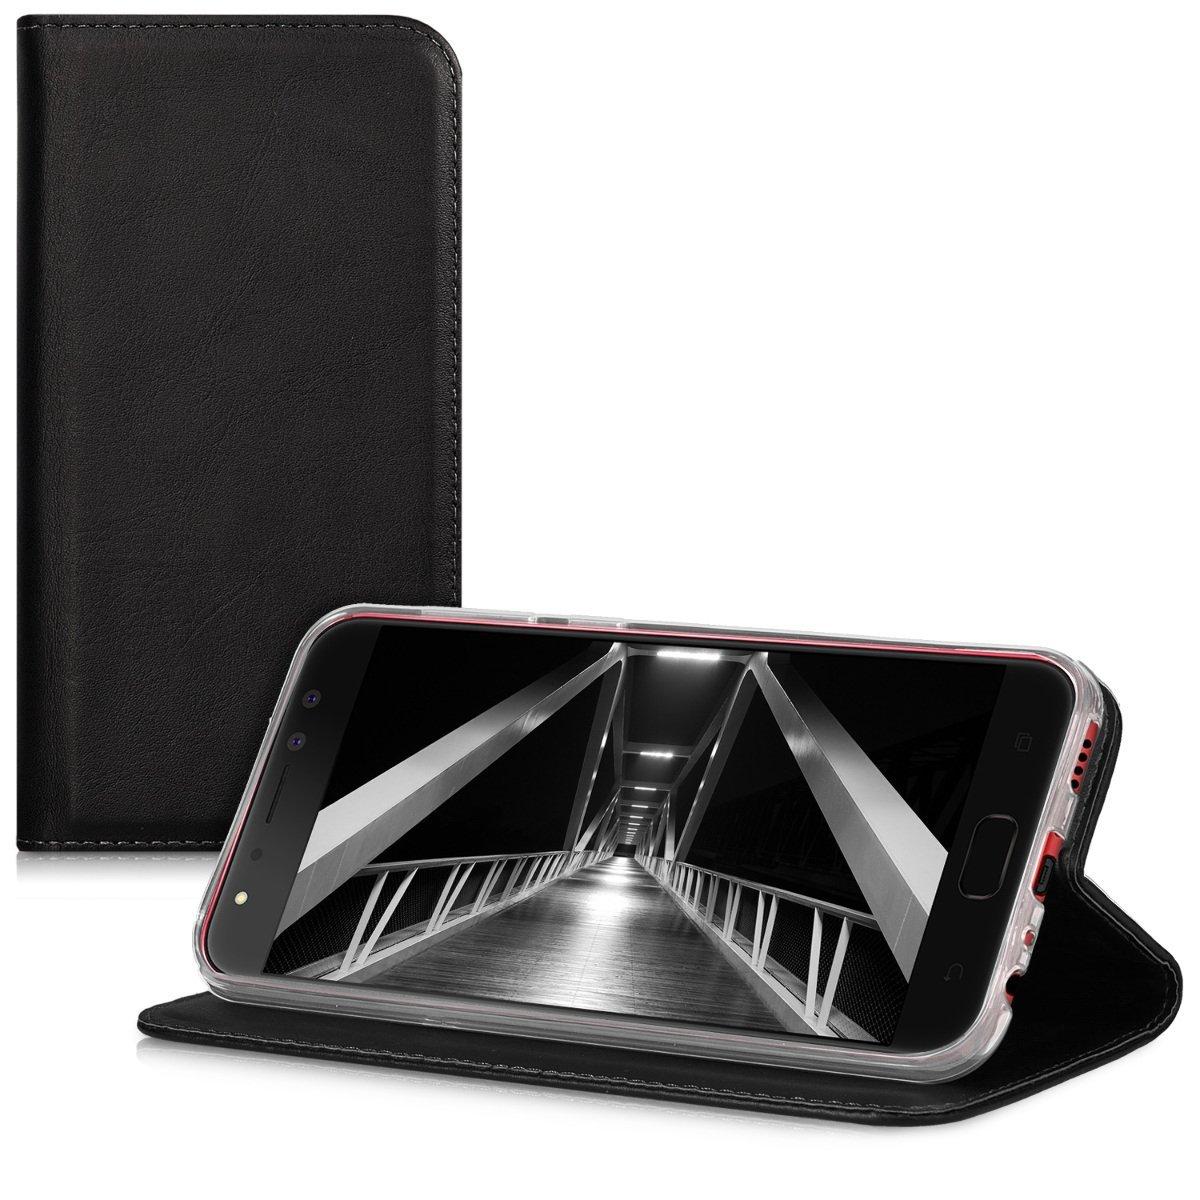 KW Flip Θήκη Asus Zenfone 4 Selfie Pro - Black (42967.01) θήκες κινητών